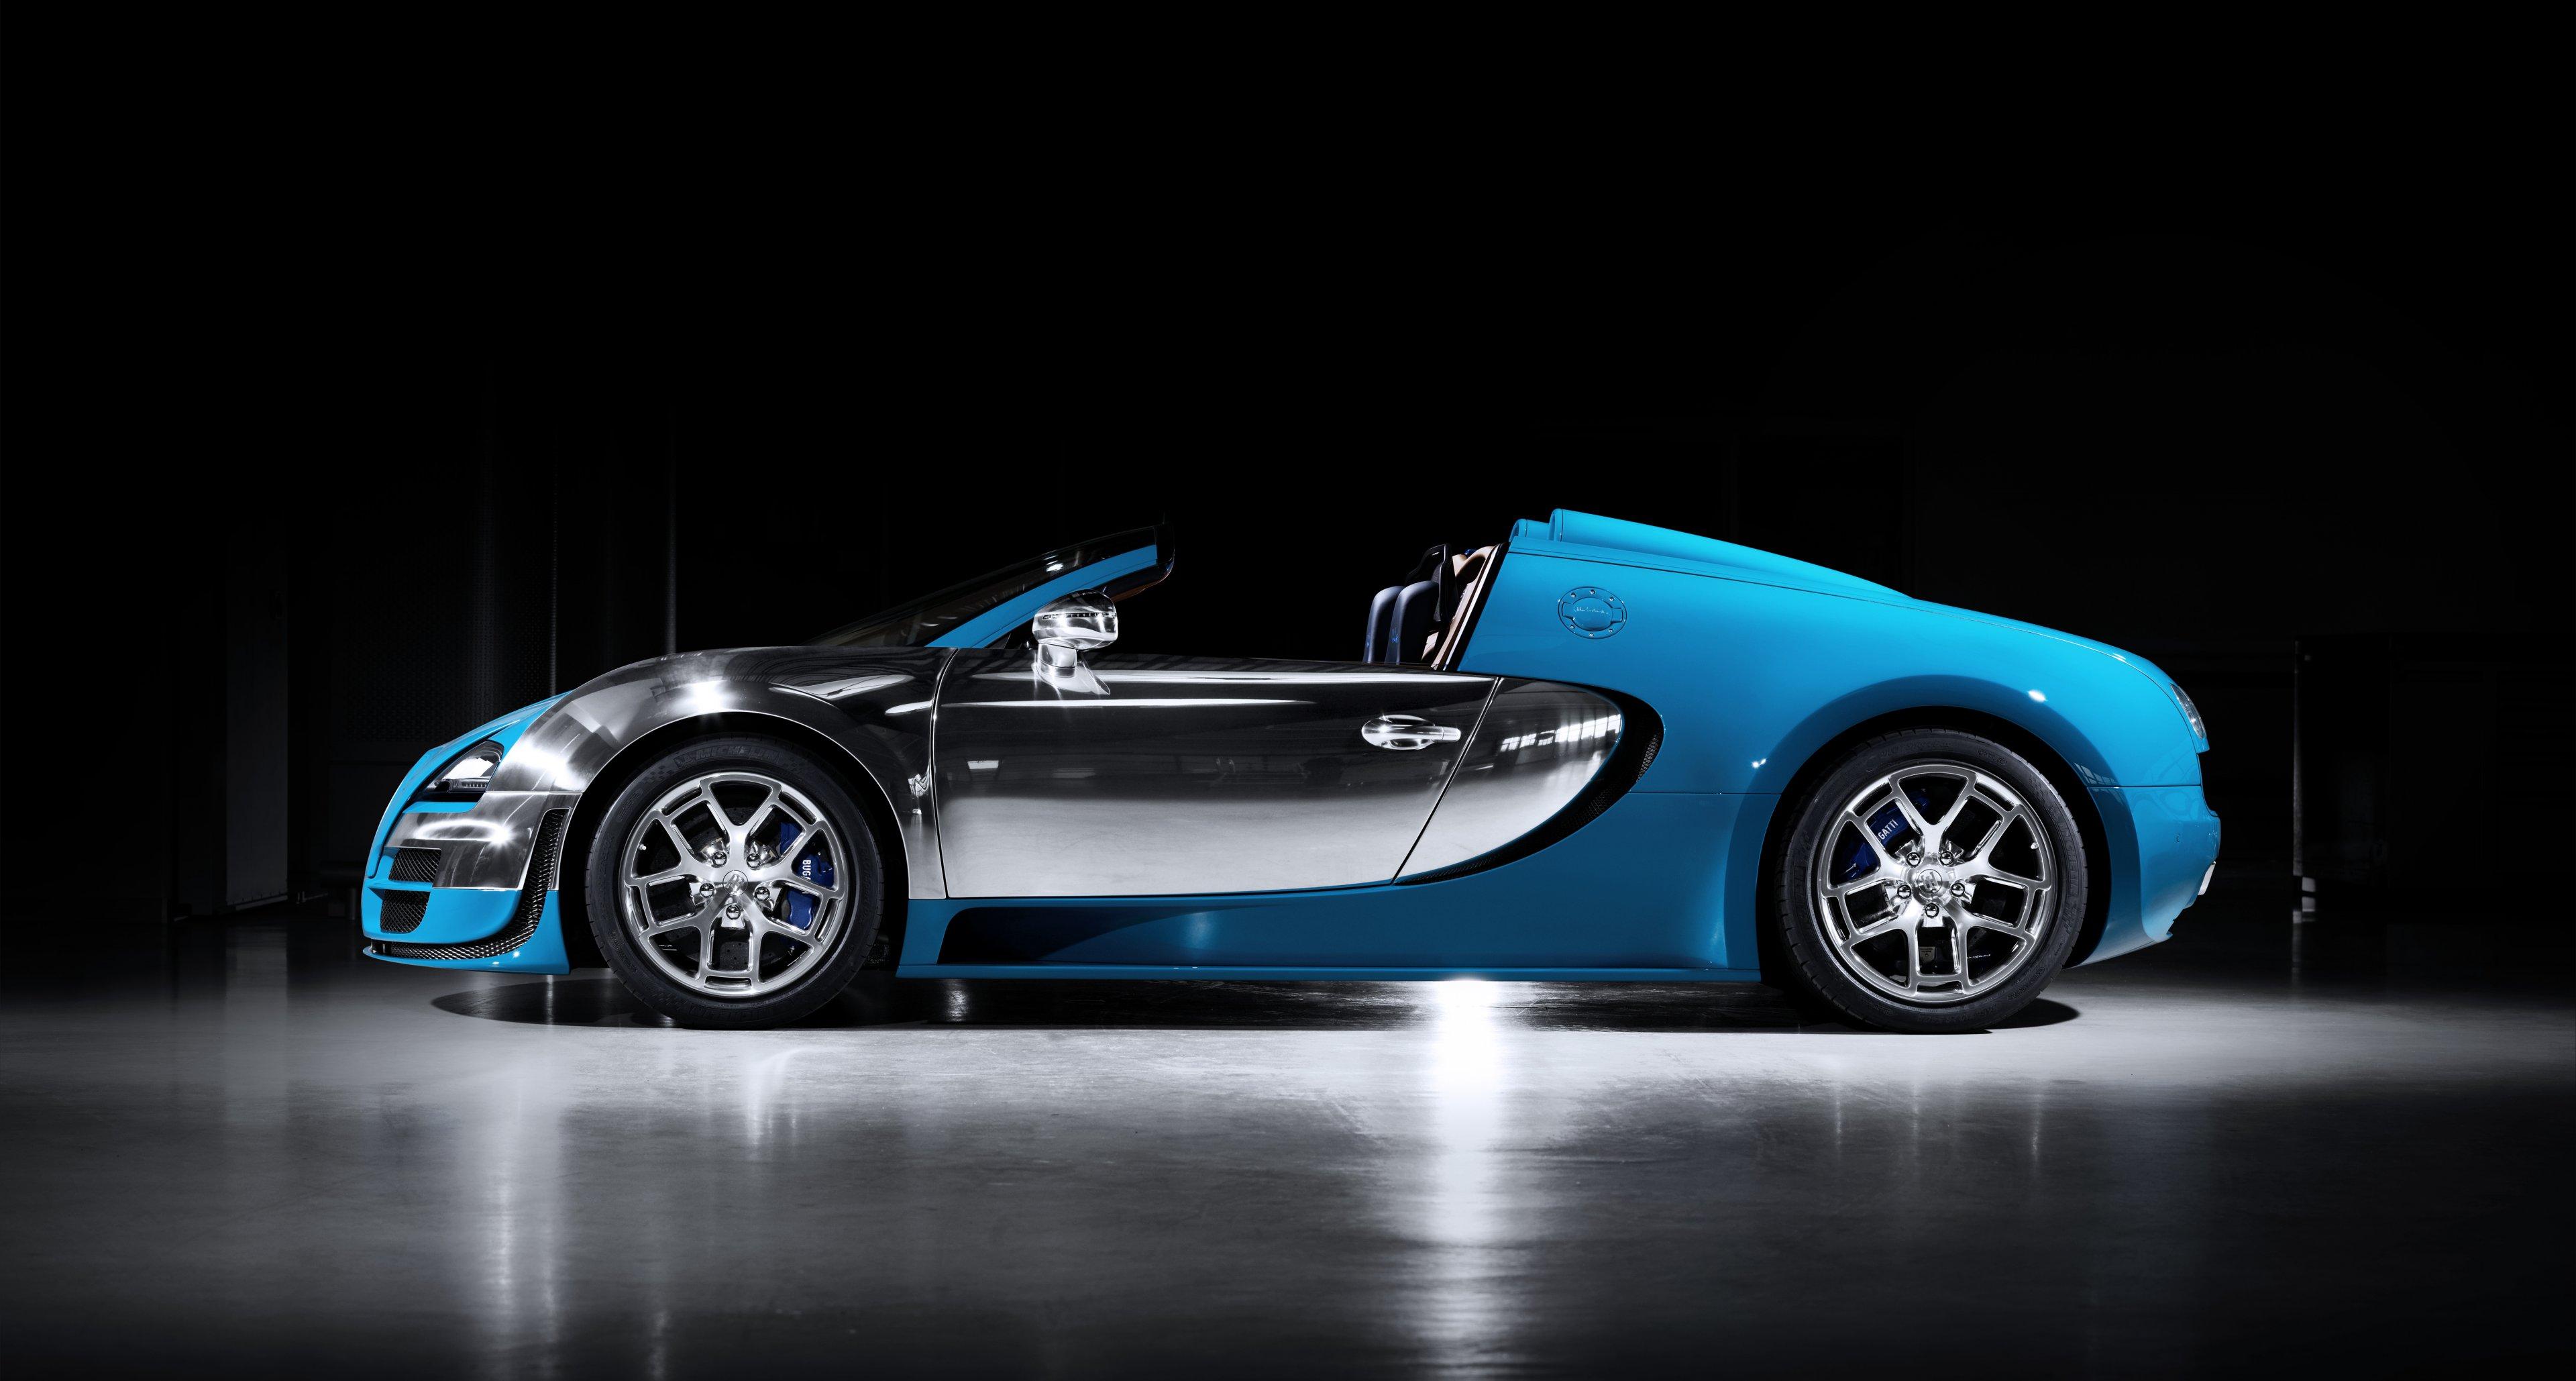 Bugatti Legend Series Number 3 dedicated to Meo Constantini.